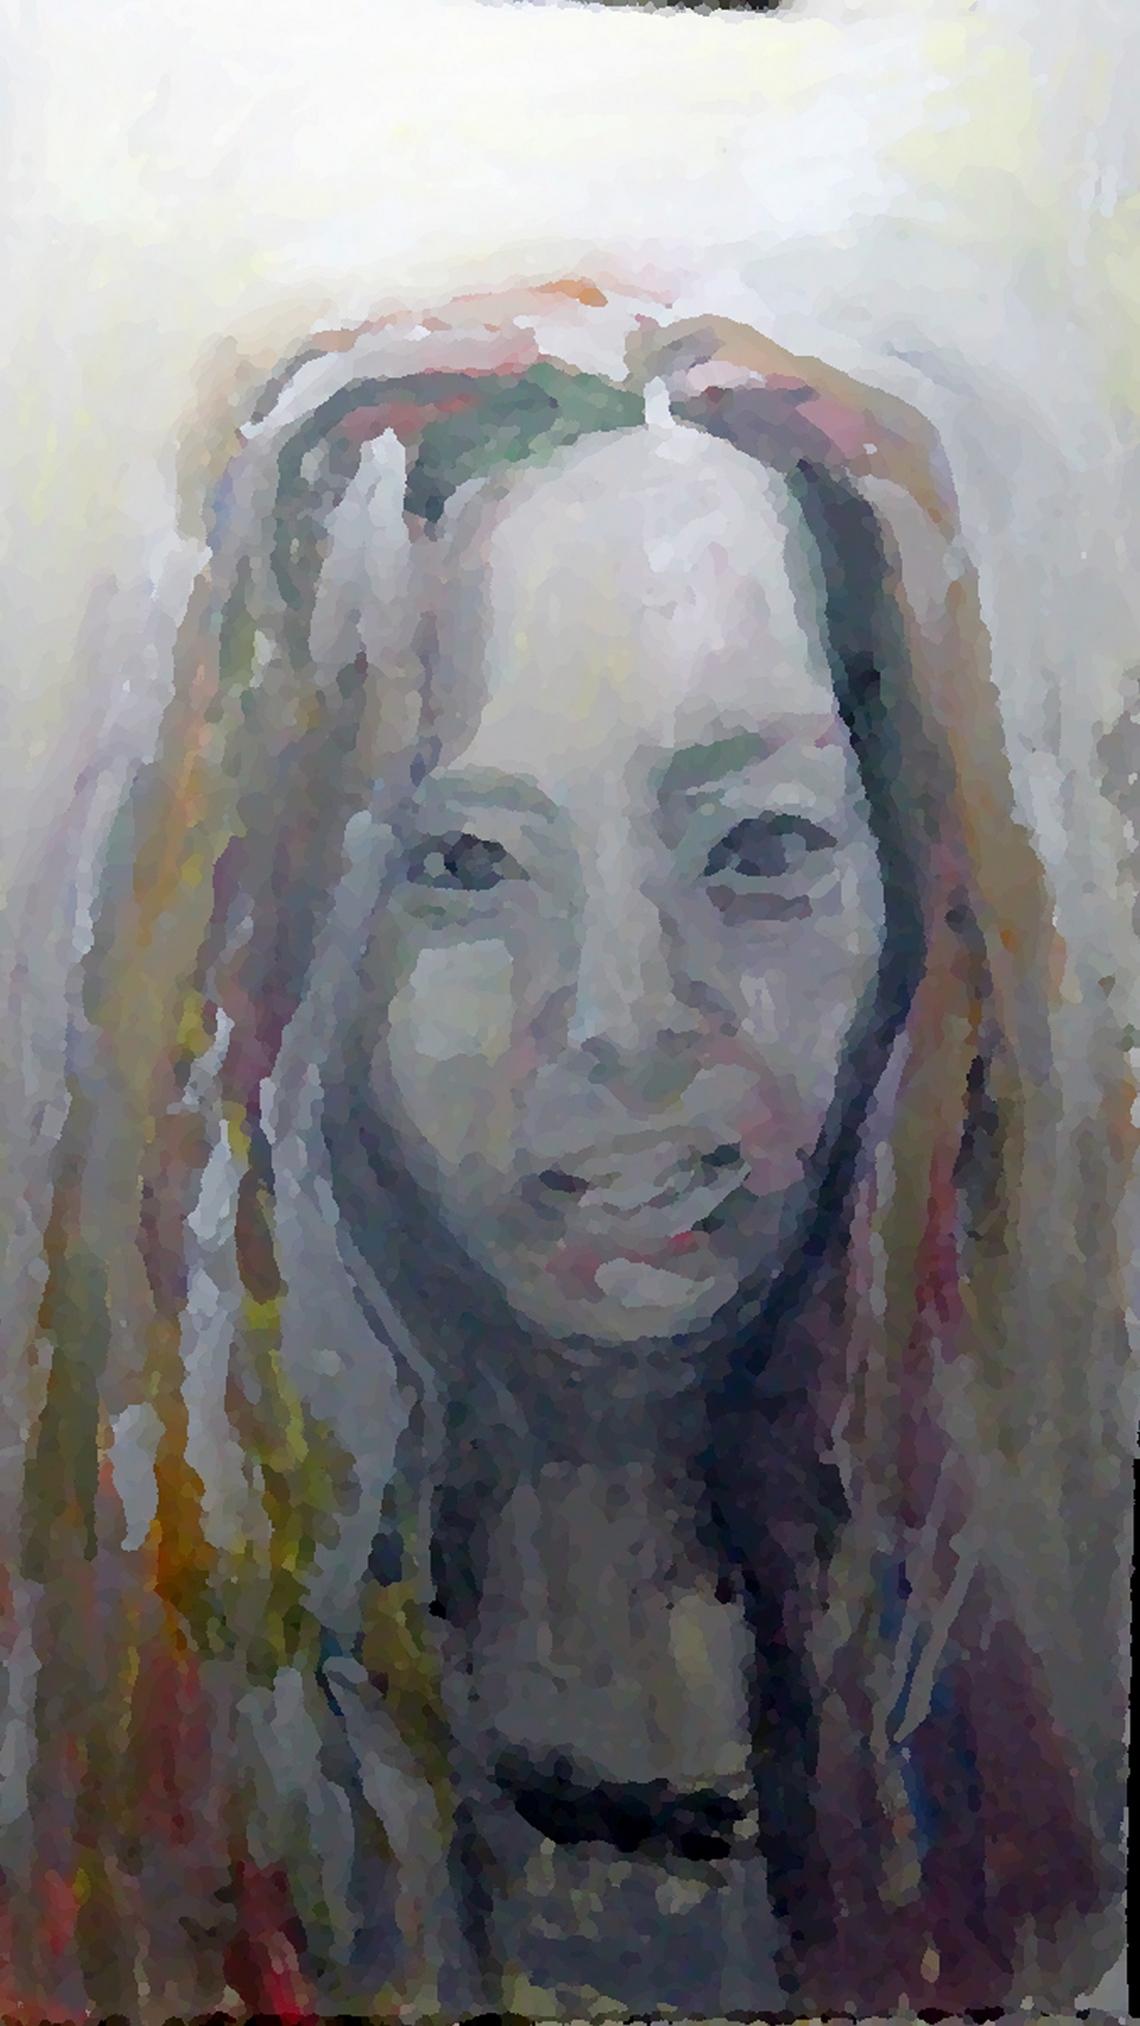 Oil sketch digitally remastered